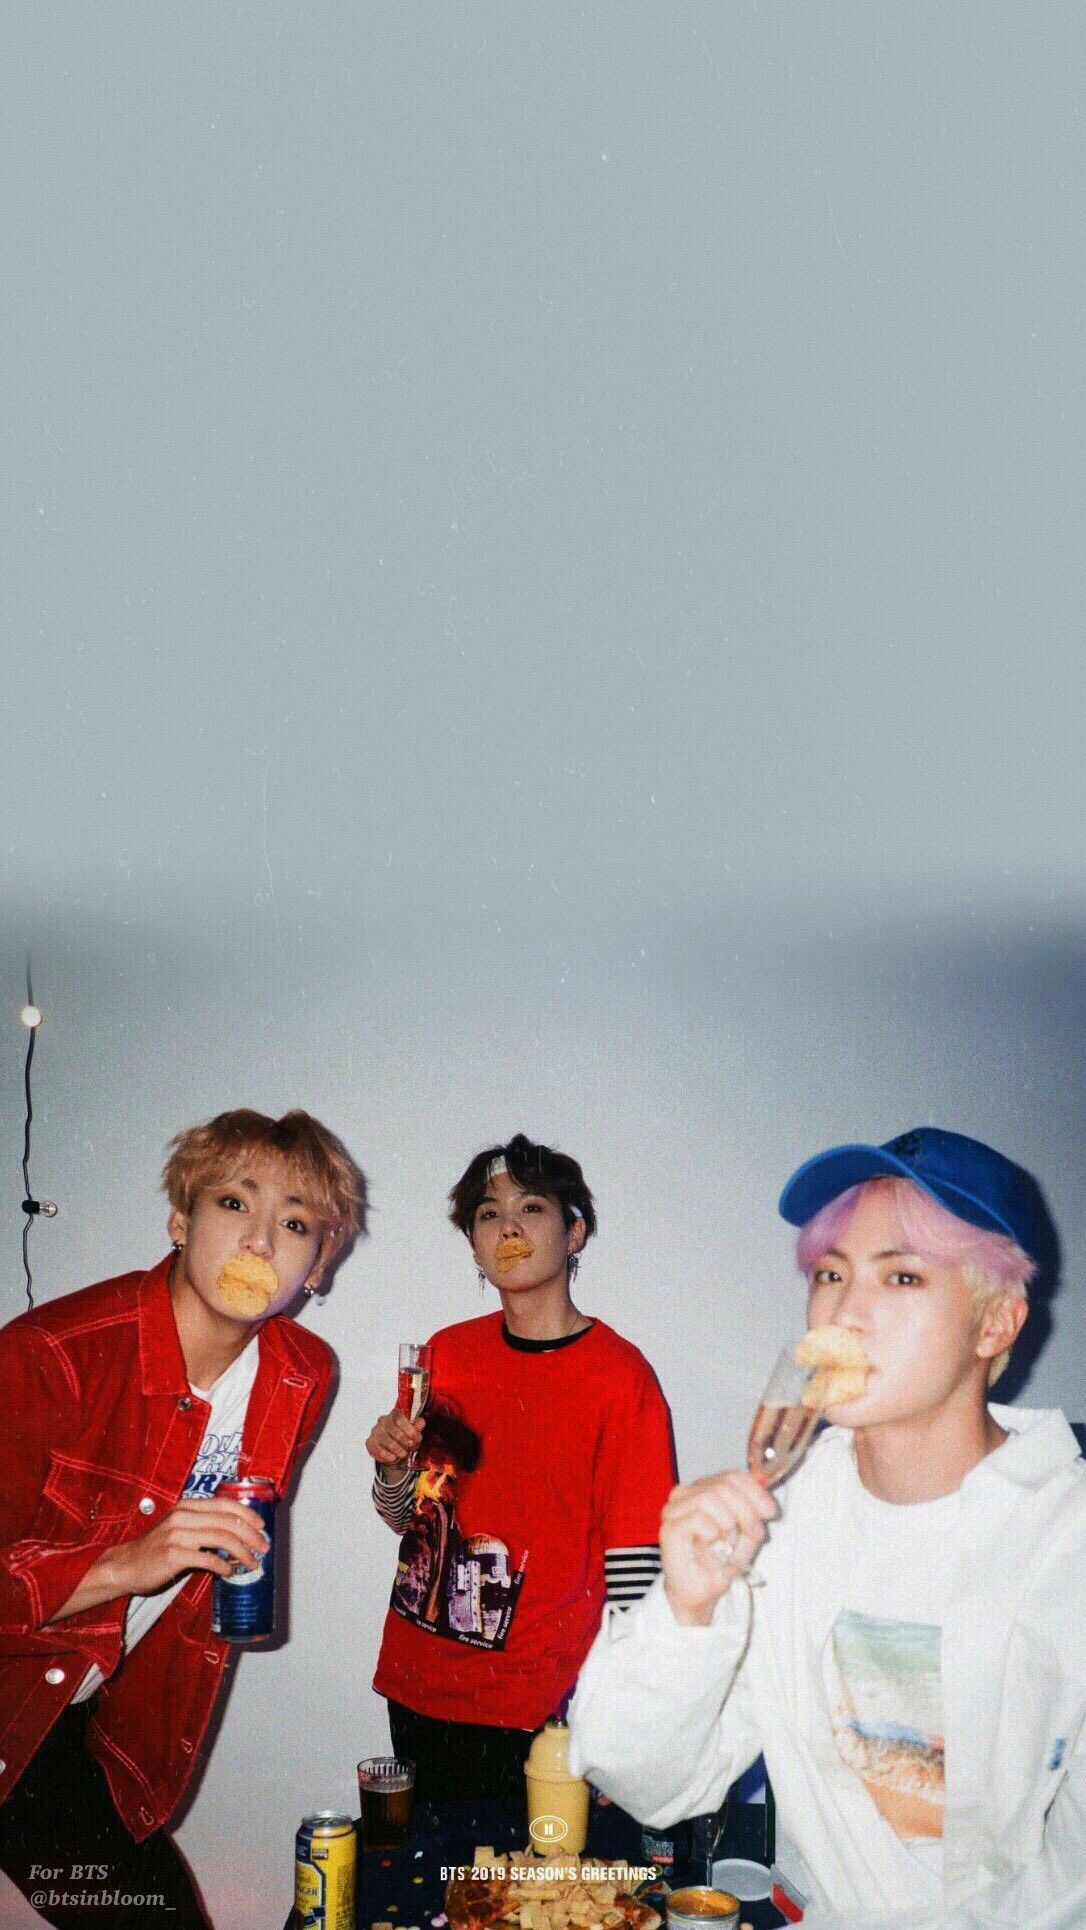 Cr Btsinbloom Bts 2019 Season S Greetings Preview Jin Suga Jungkook Bts Wallpaper Bts Season Greeting Album Bts